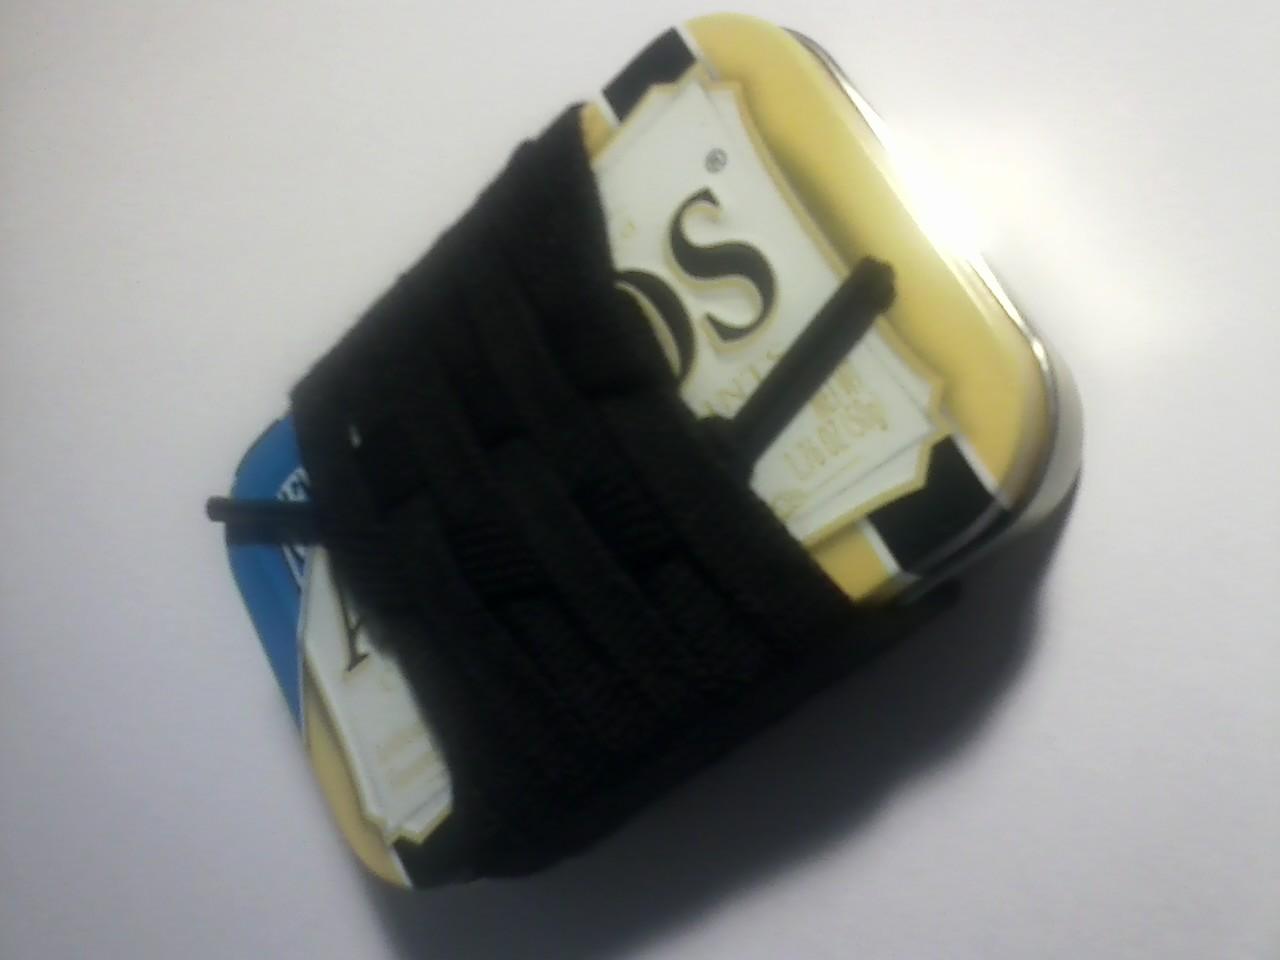 Pocket-Sized Altoids Tin First-Aid Kit